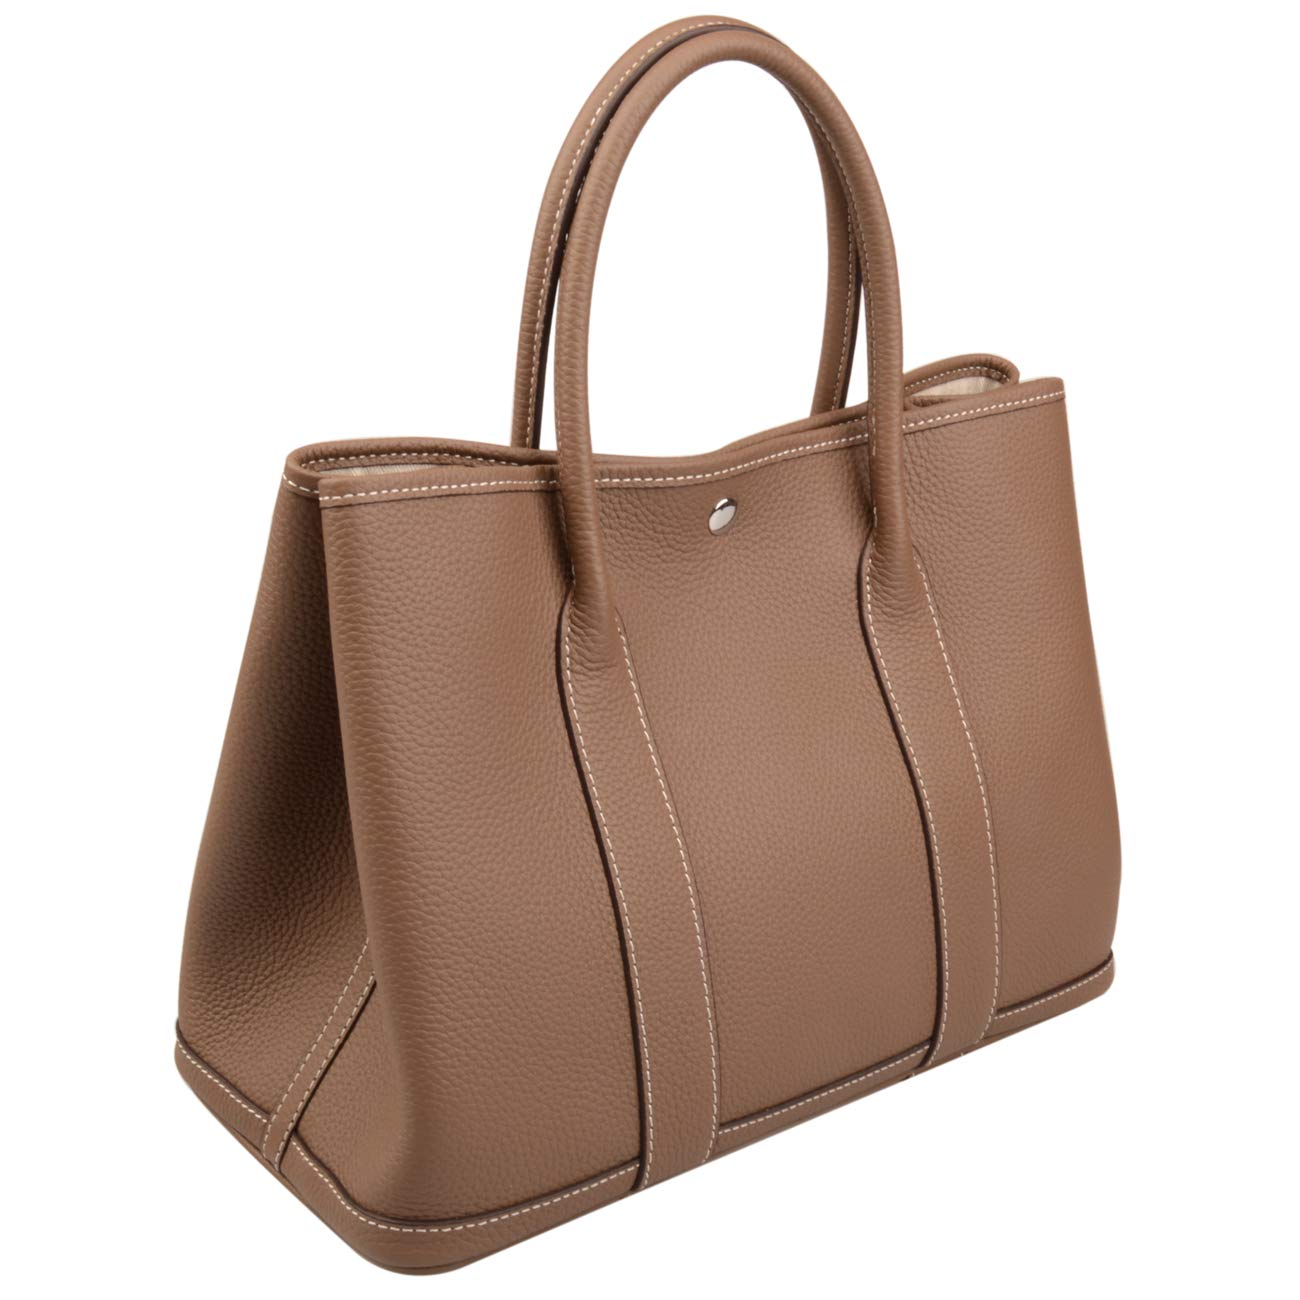 Ainifeel Women's Genuine Leather Top Handle Handbag Shopping Bag Tote Bag (Khaki)